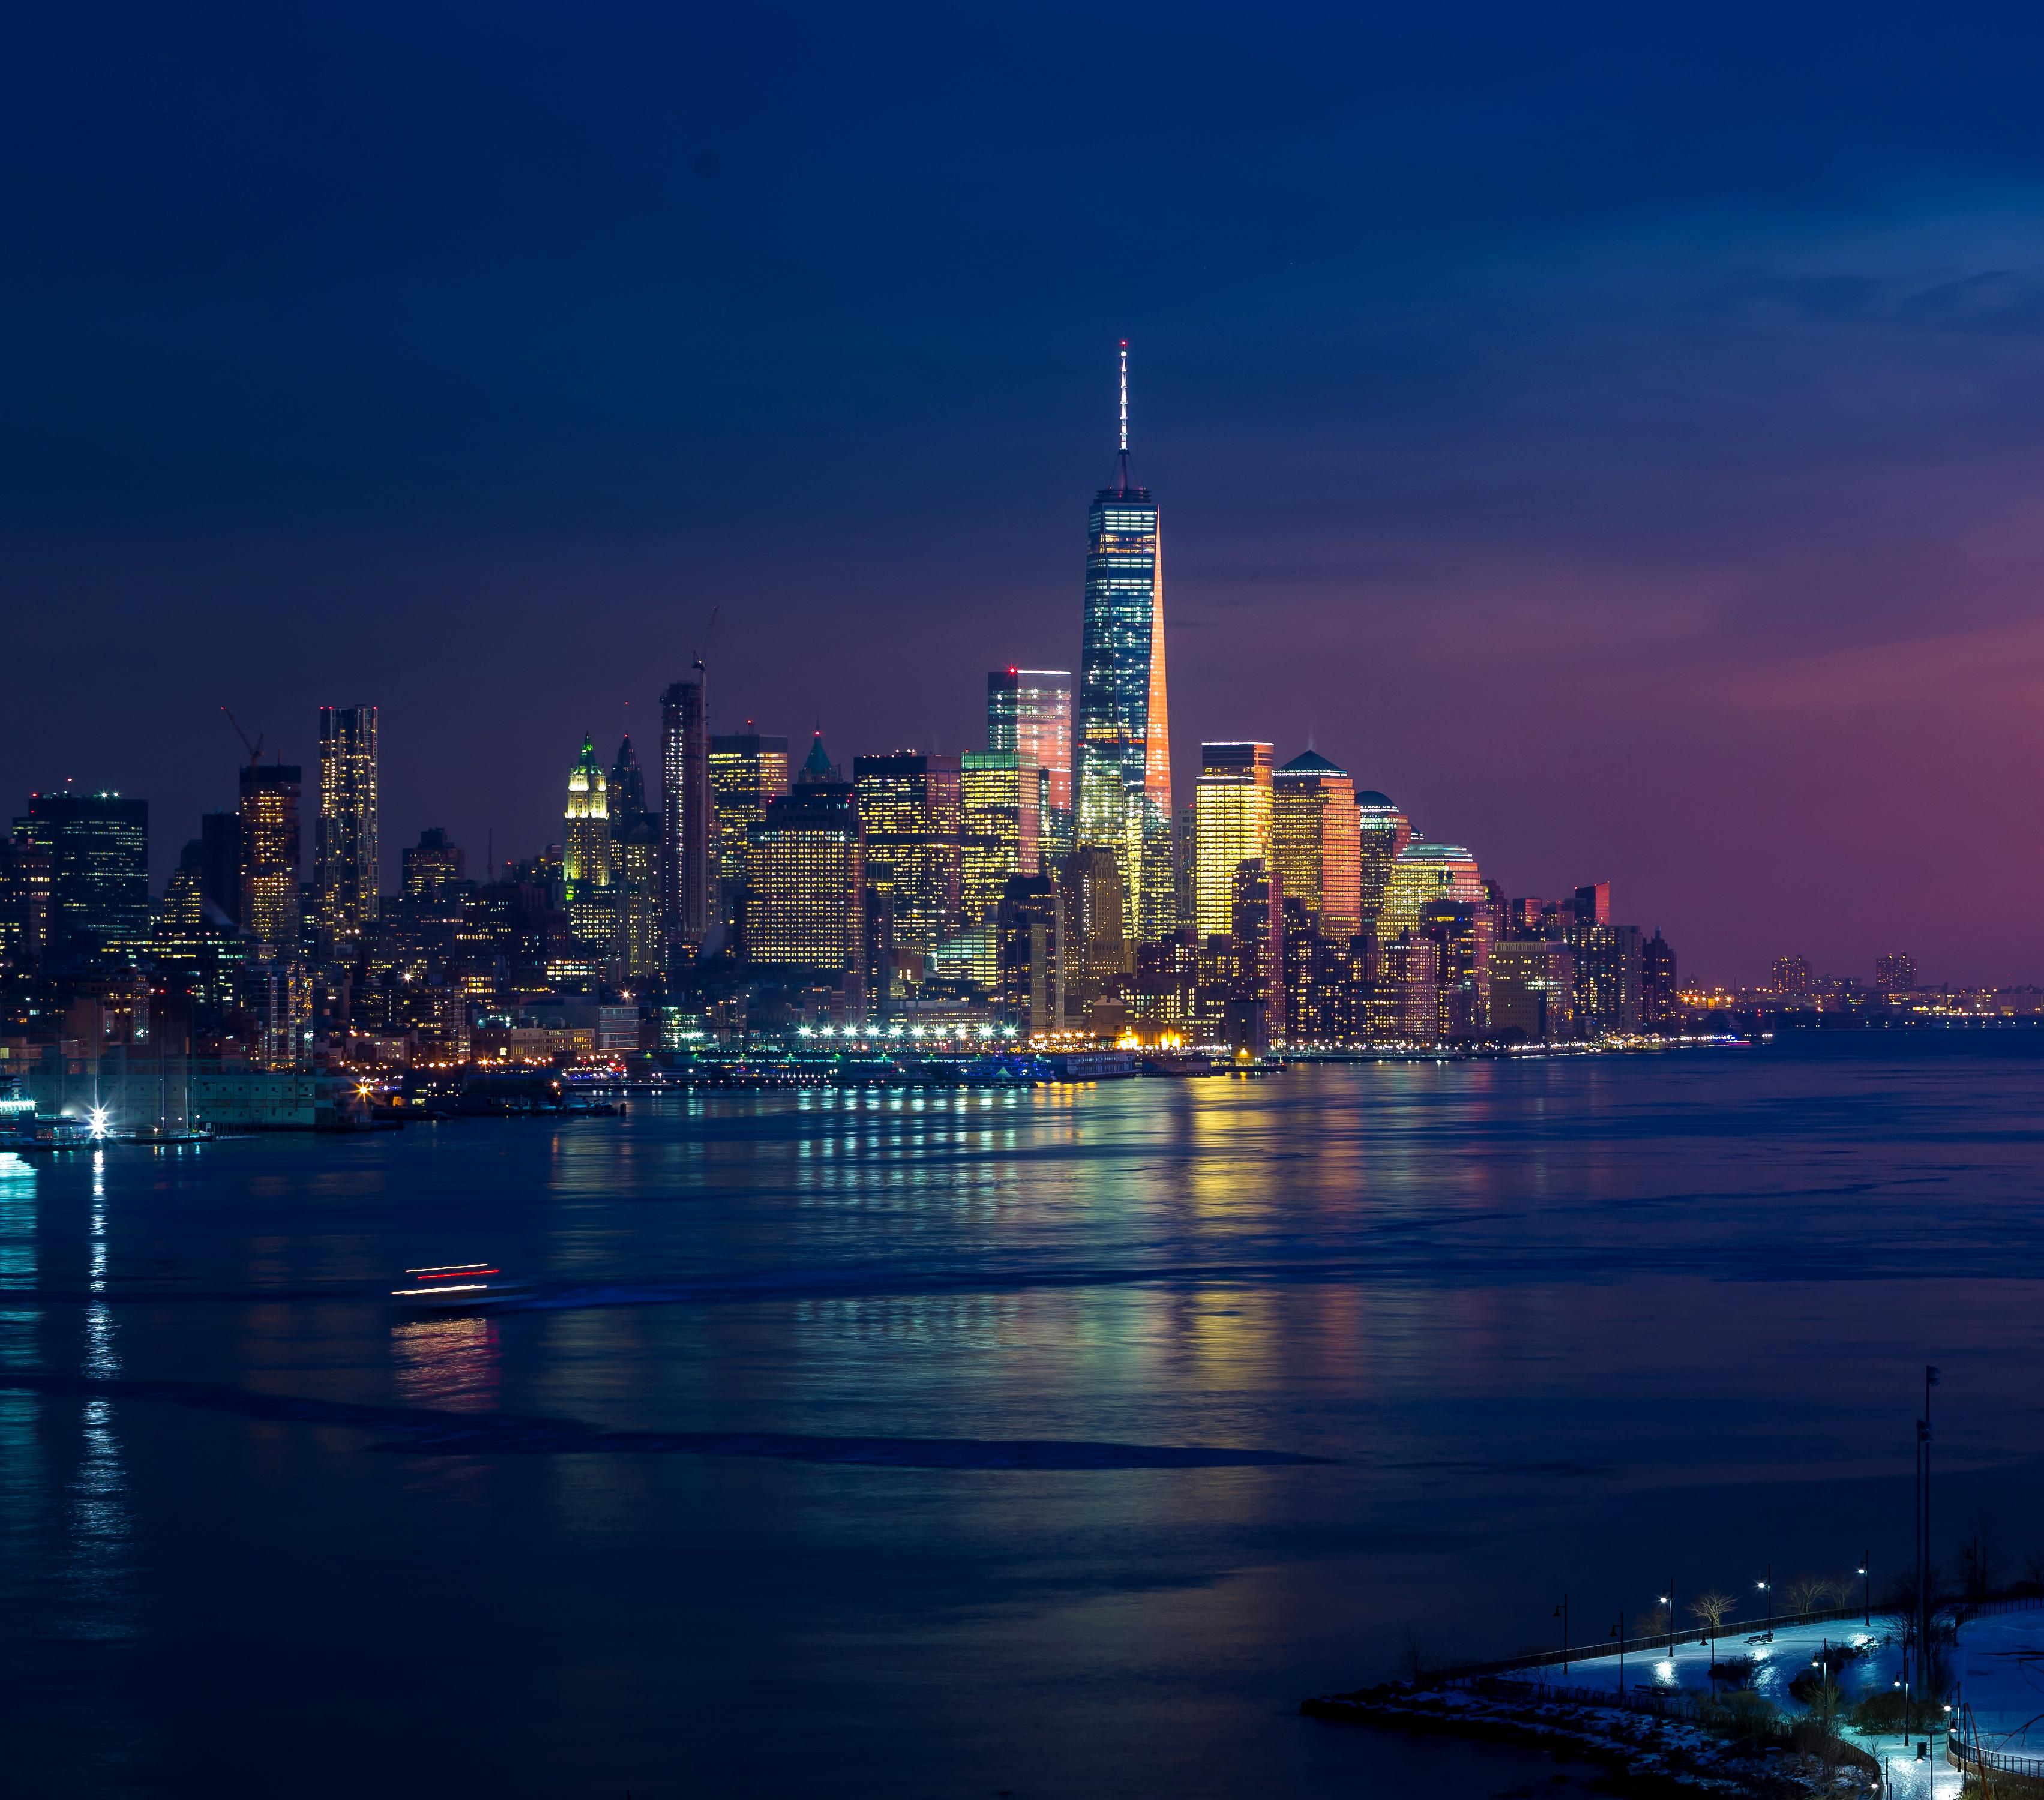 Tesla Model S 4k Hd Desktop Wallpaper For 4k Ultra Hd Tv: New York Skycrapper And Buildings Lights, HD 4K Wallpaper